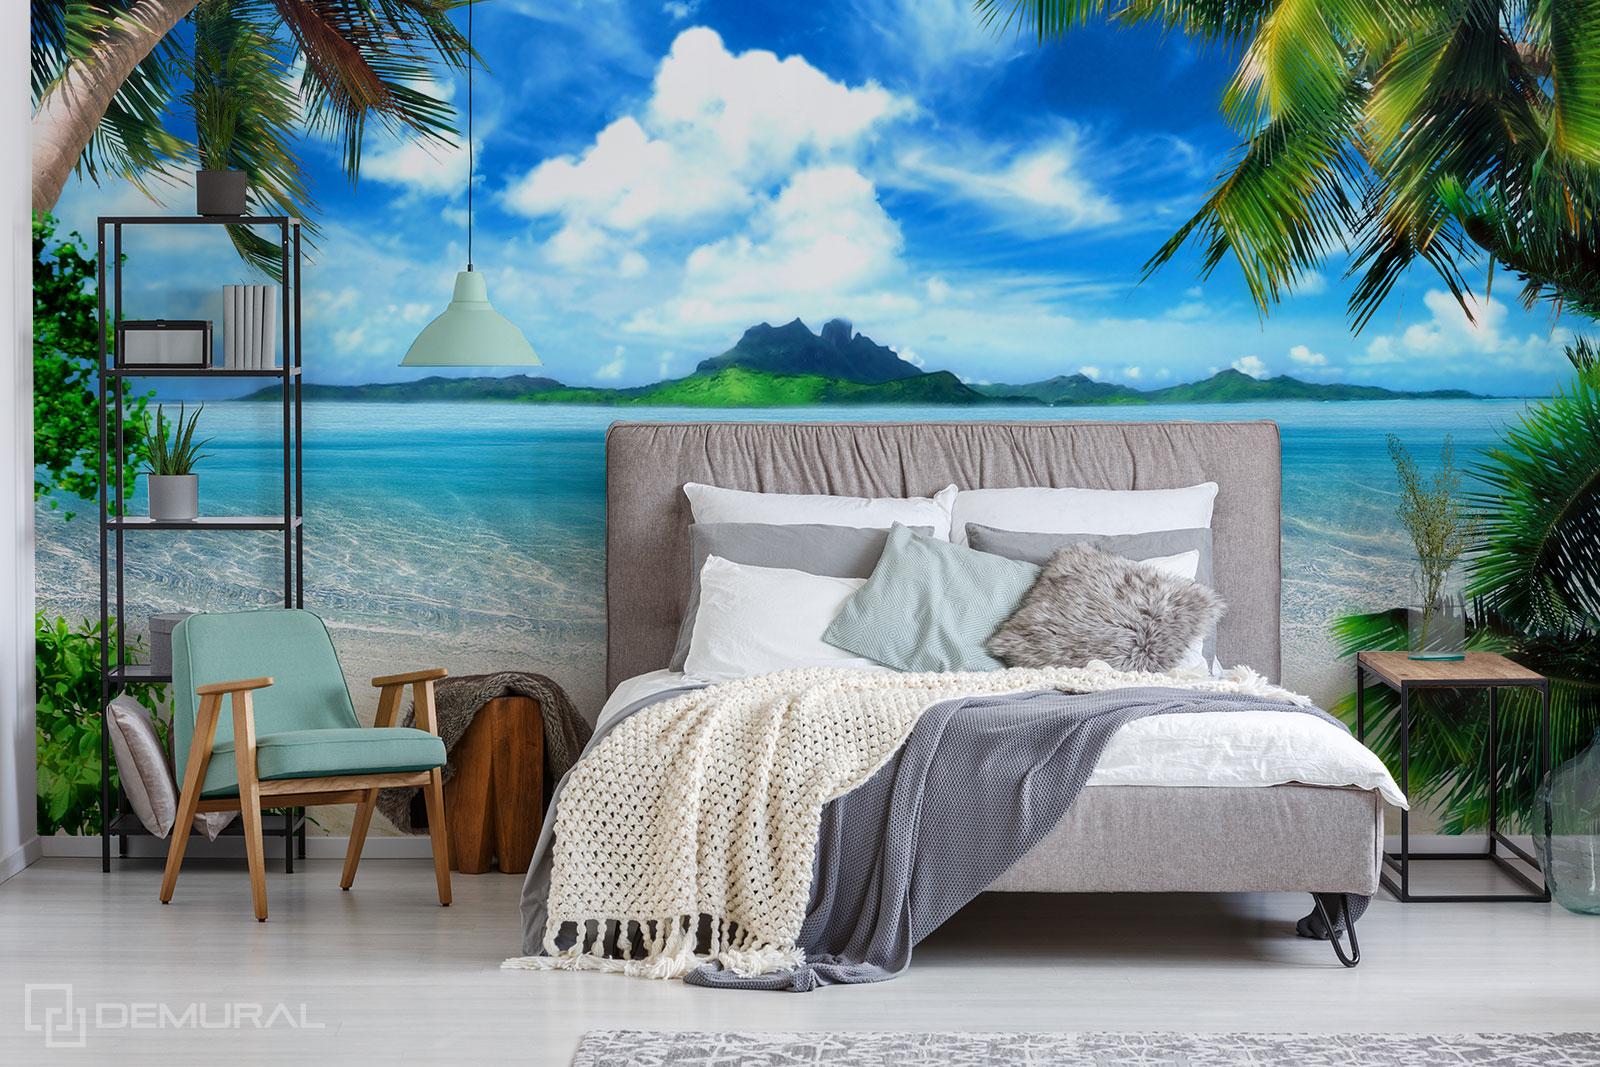 Fototapeta Pod palmami - Fototapeta z plażą - Demural